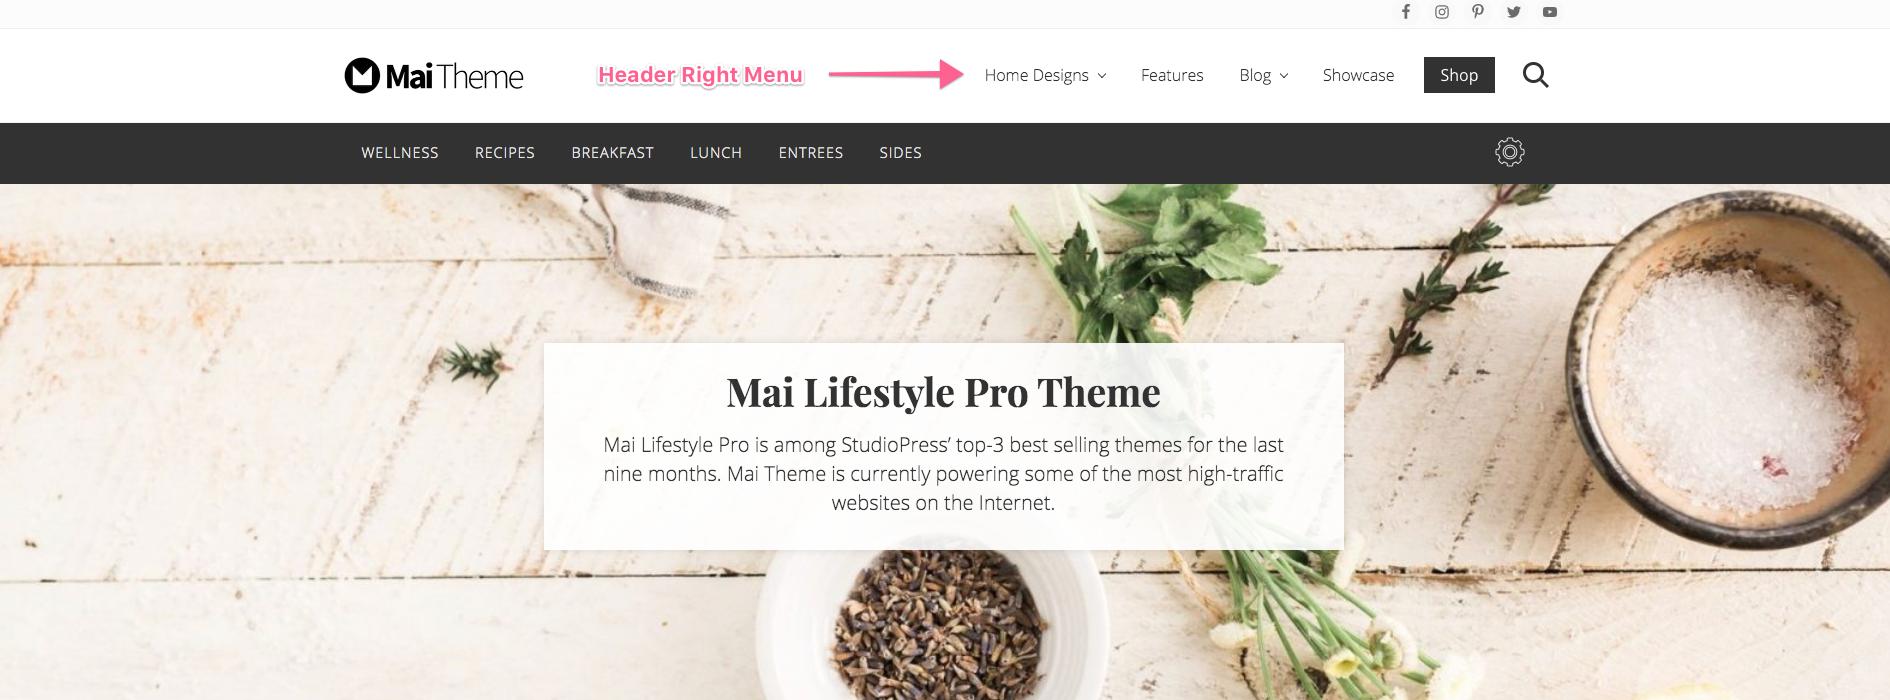 header-right-menu screen image